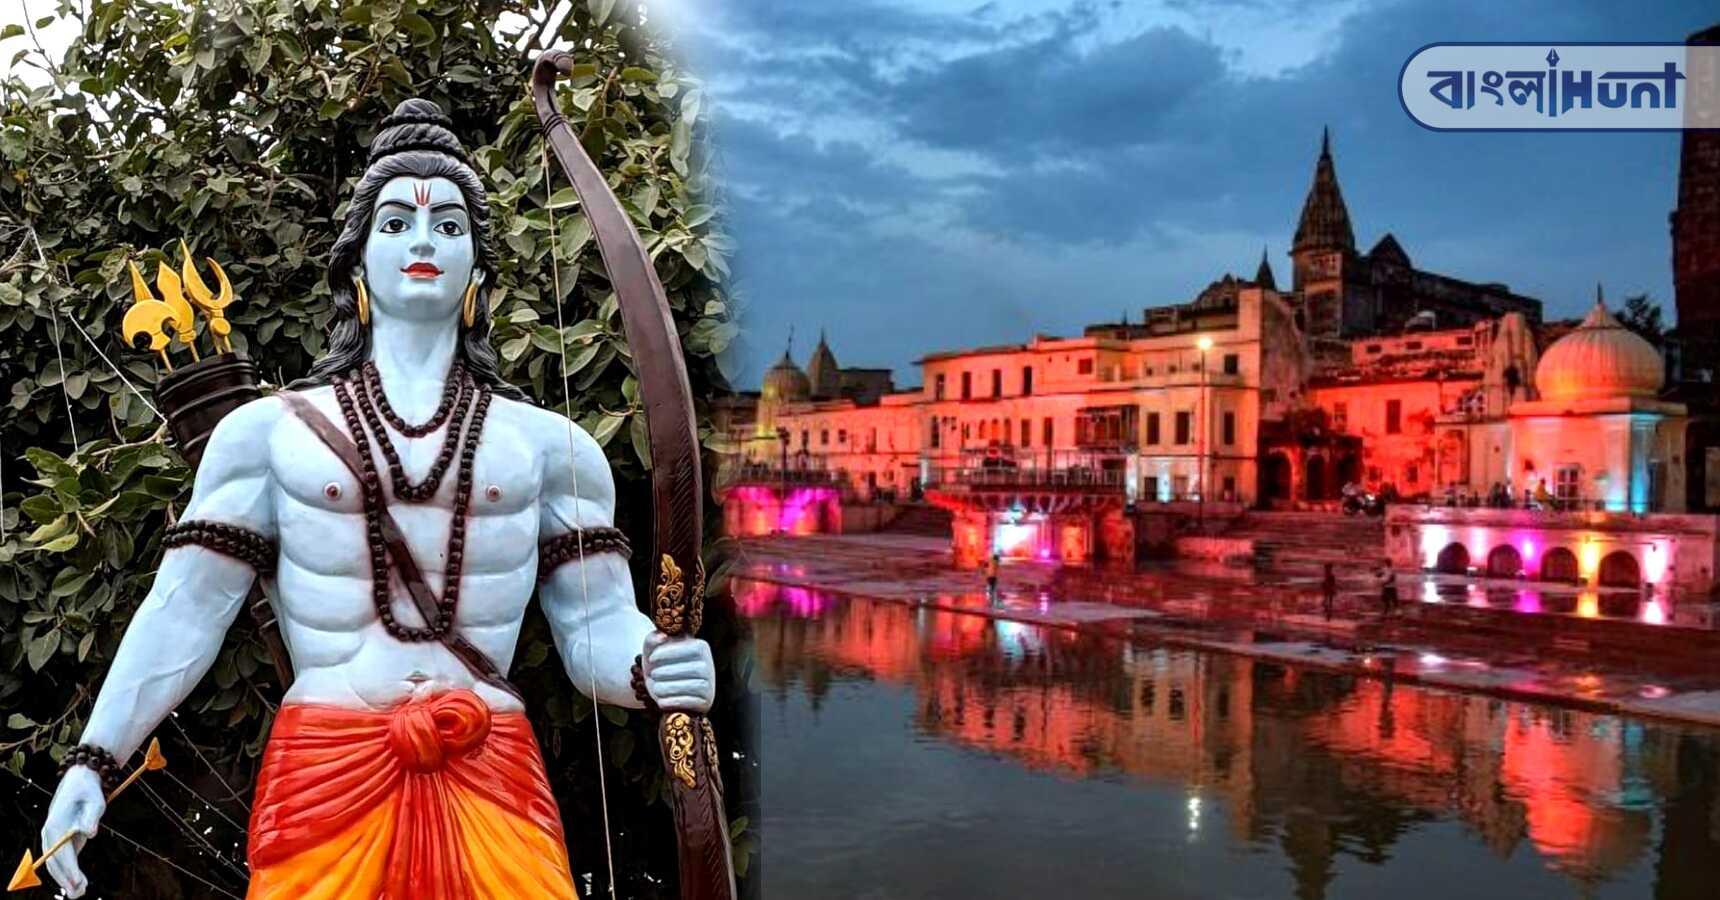 shree-ram-university-will-be-built-in-ayodhya